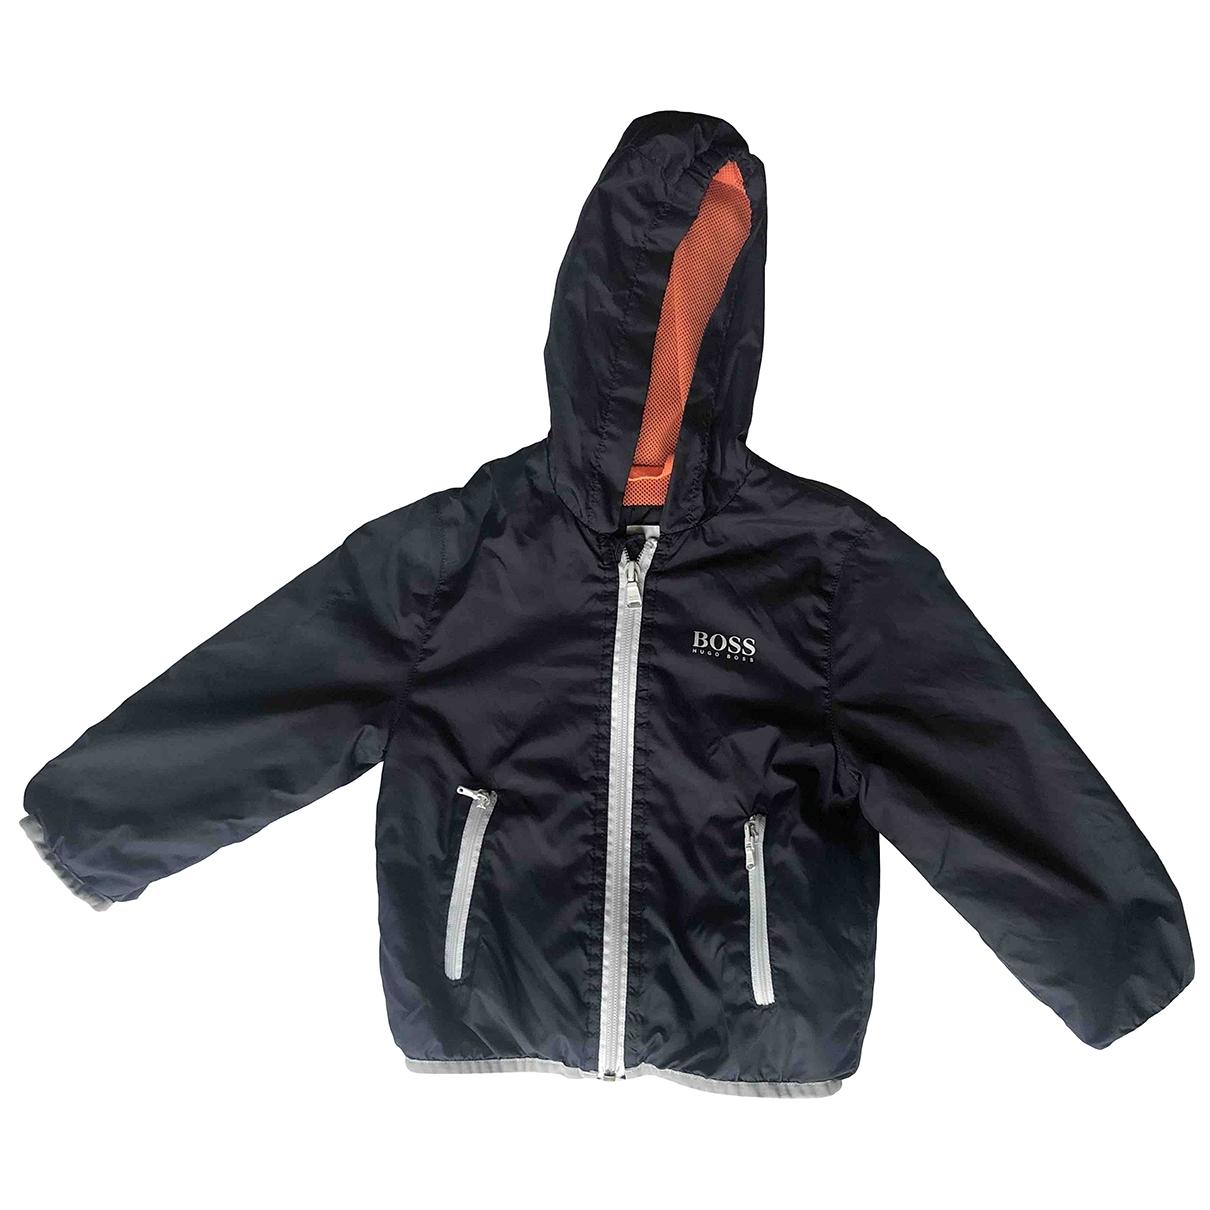 Hugo Boss \N Blue jacket & coat for Kids 3 years - up to 98cm FR